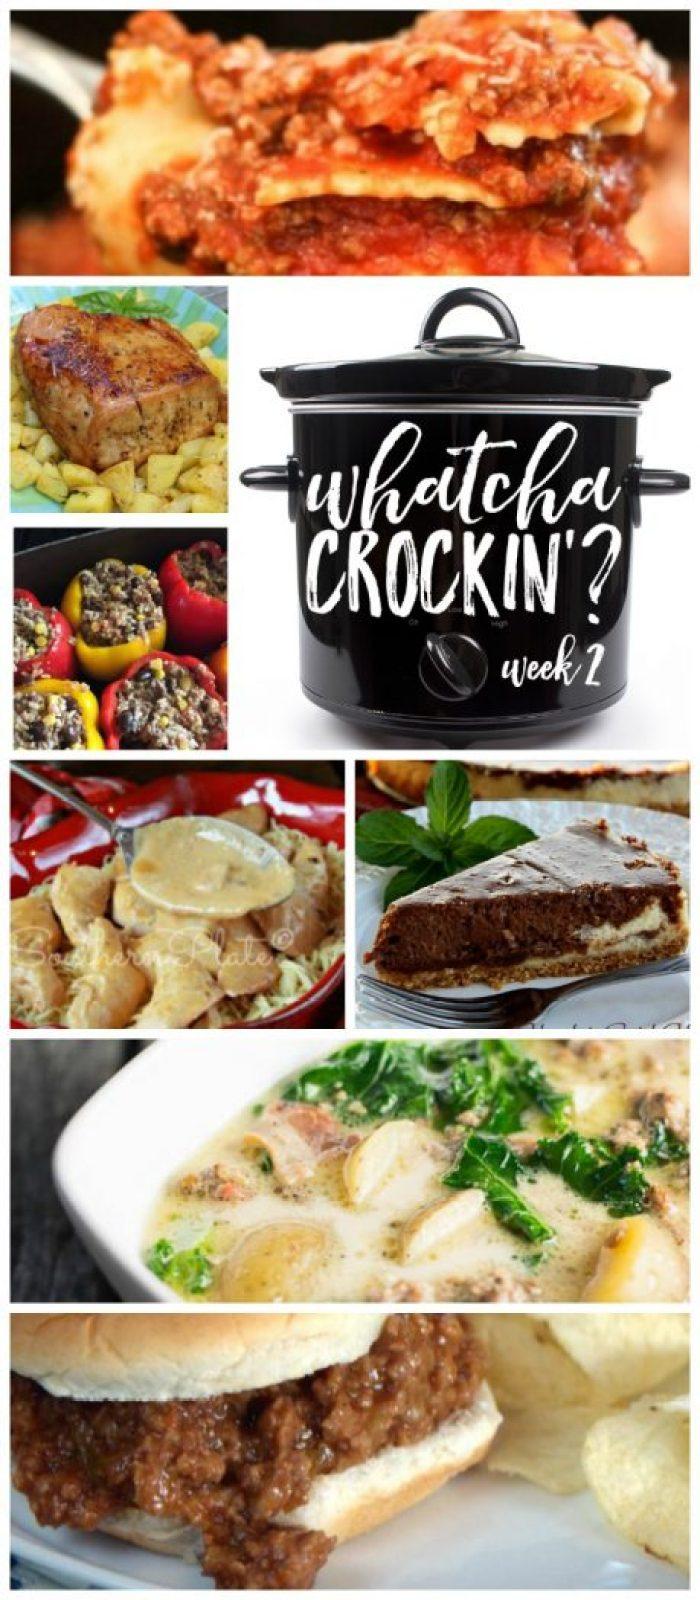 Crock Pot Recipes from Whatcha Crockin' Wednesday Week 2 include Slow Cooker Angel Chicken, Crock Pot Sloppy Joes, Crock Pot Zuppa Toscana Soup, Crock Pot Ravioli, Crock Pot Chocolate Swirl Cheesecake, Crock Pot Beef Stuffed Peppers and Bourbon Brown Sugar Pork Loin